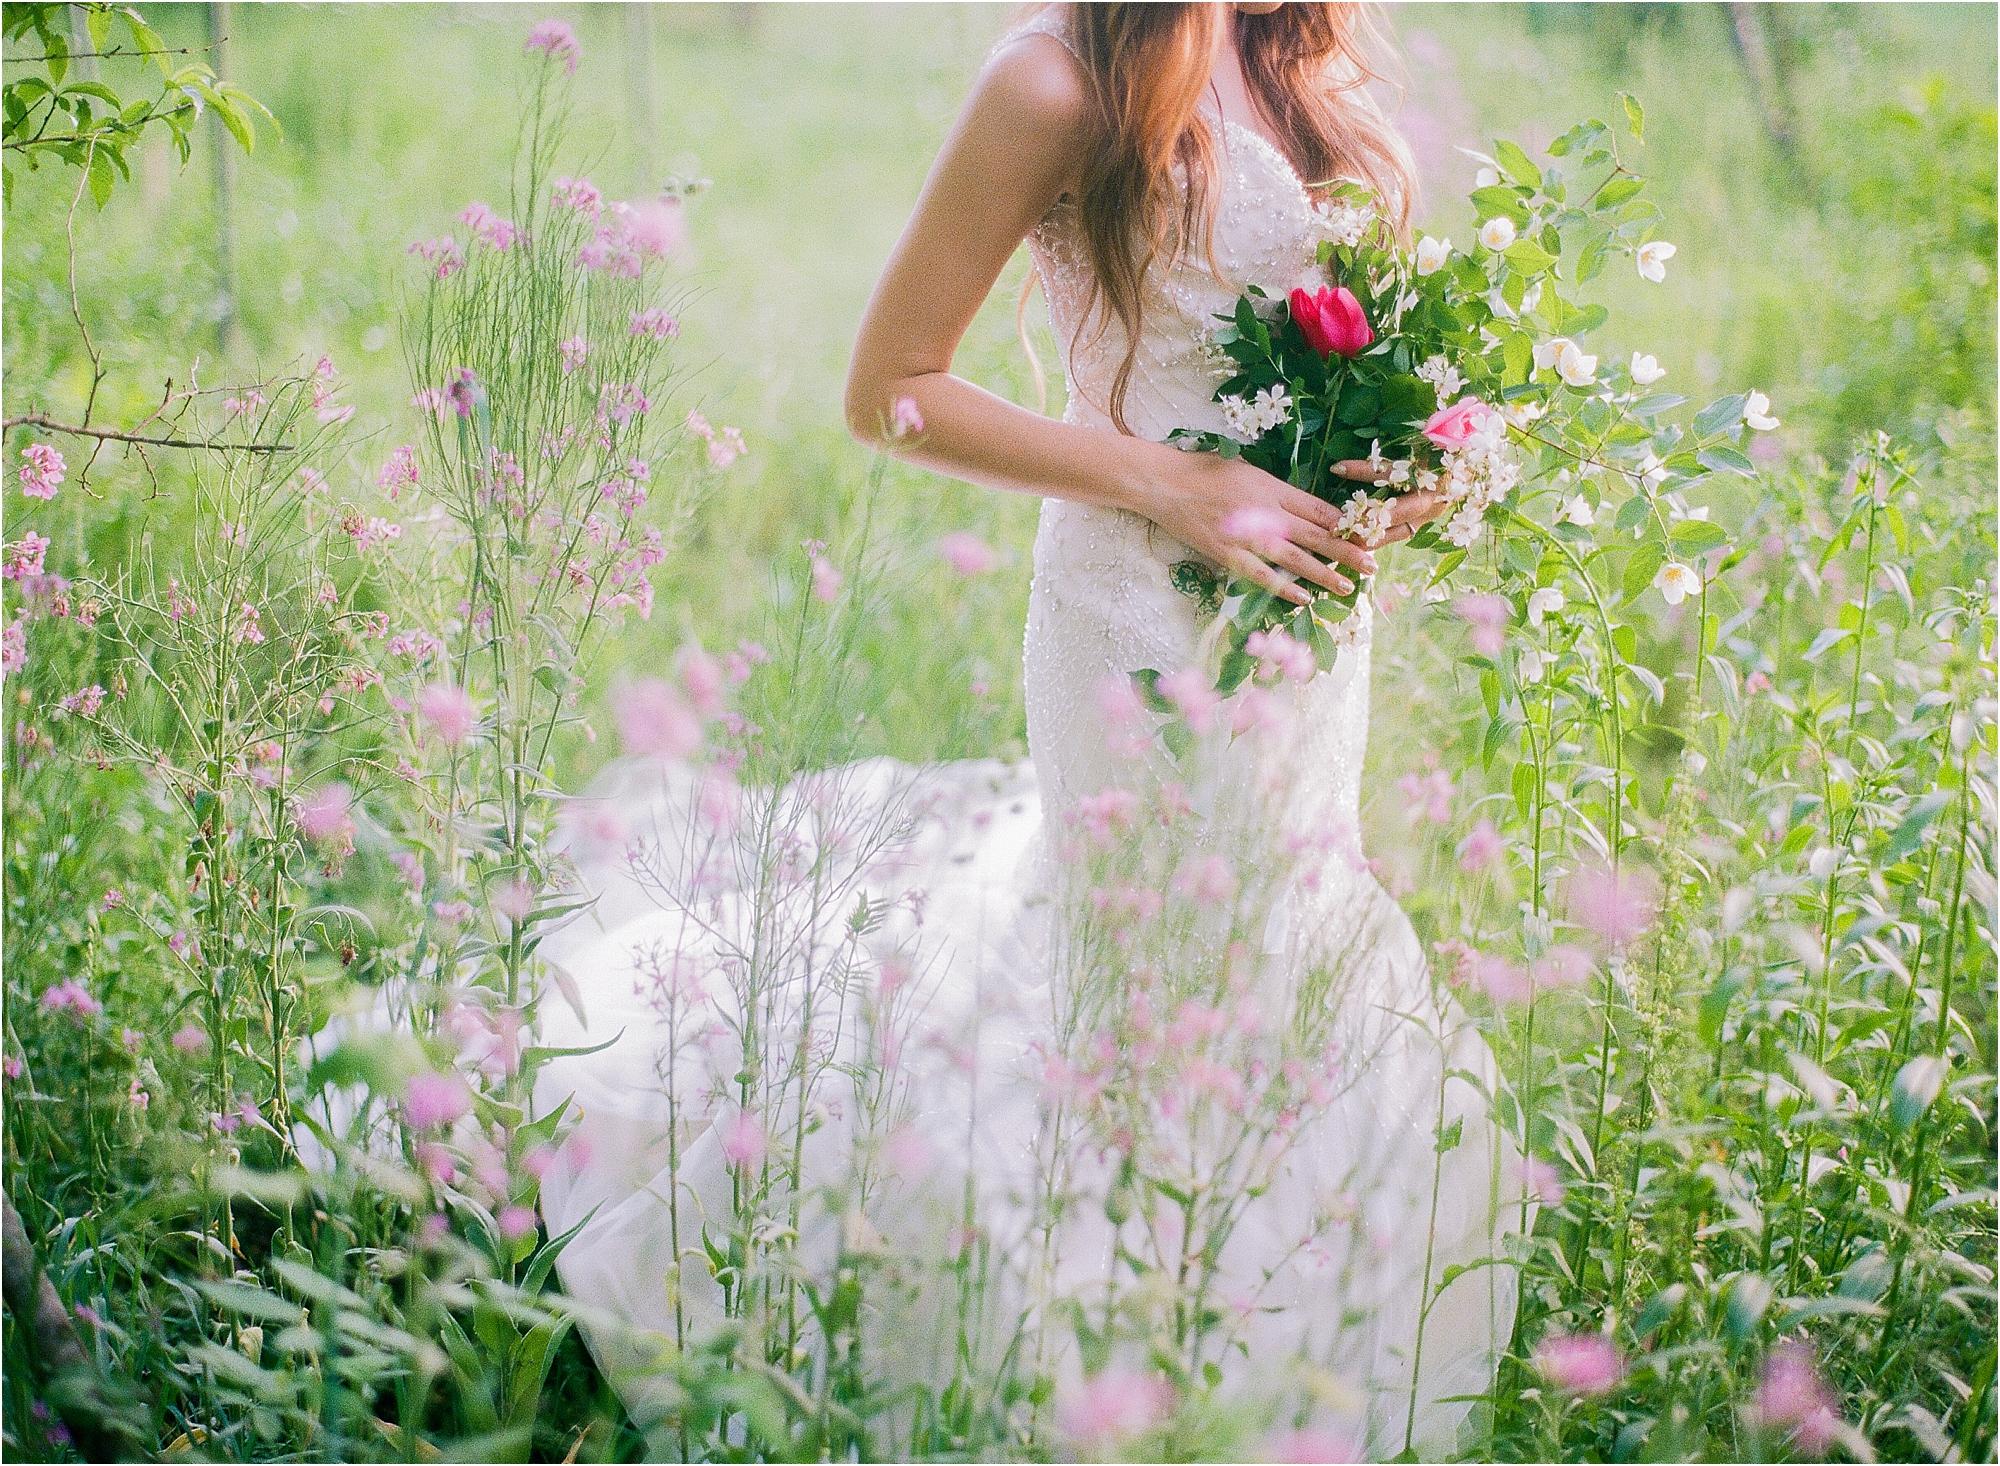 Nixa Bridal Session - Jordan Brittley Photography